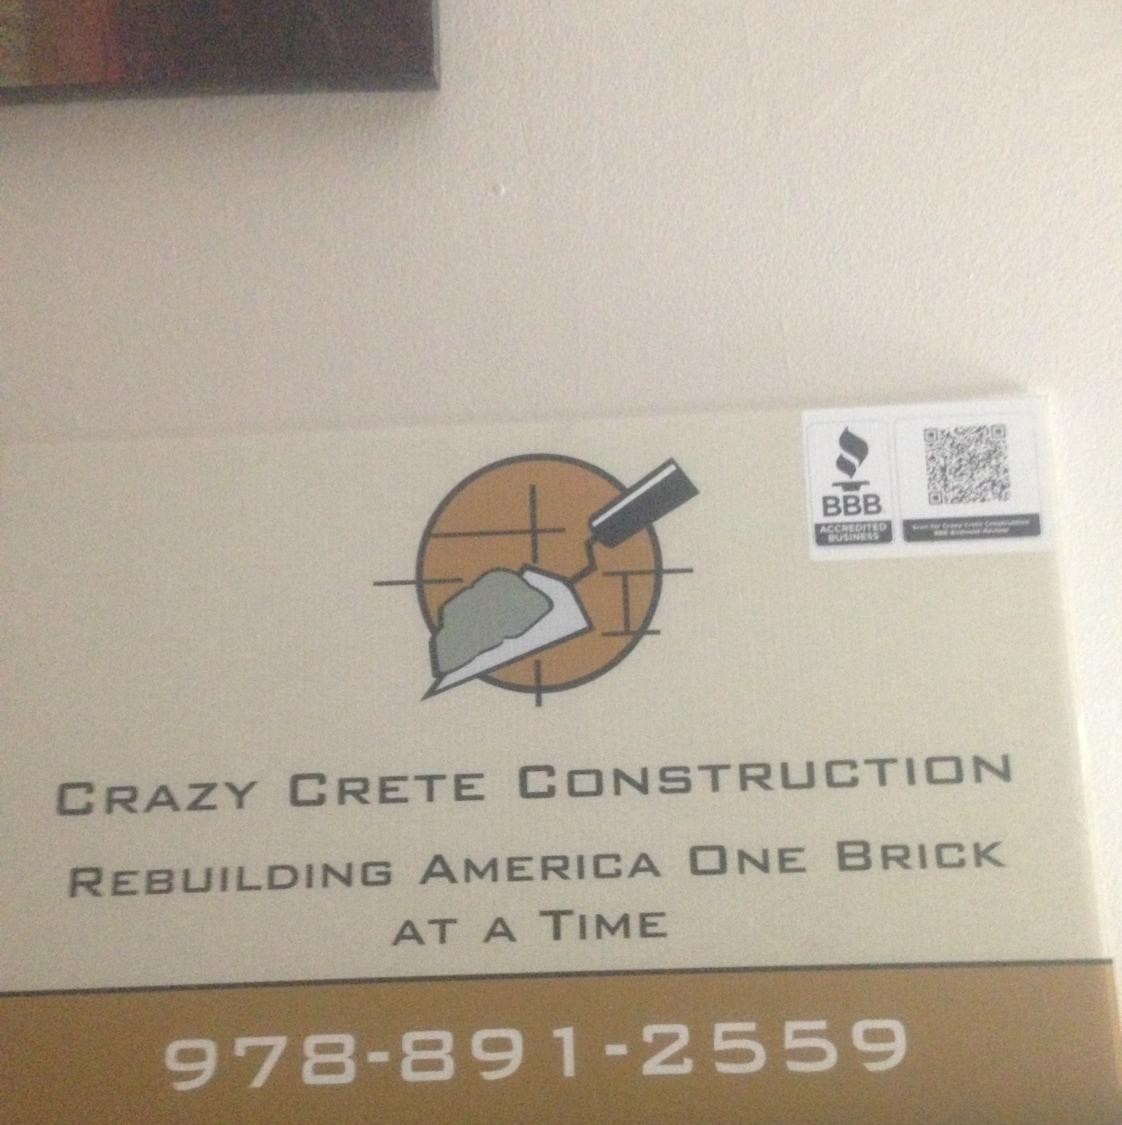 Crazy Crete Construction